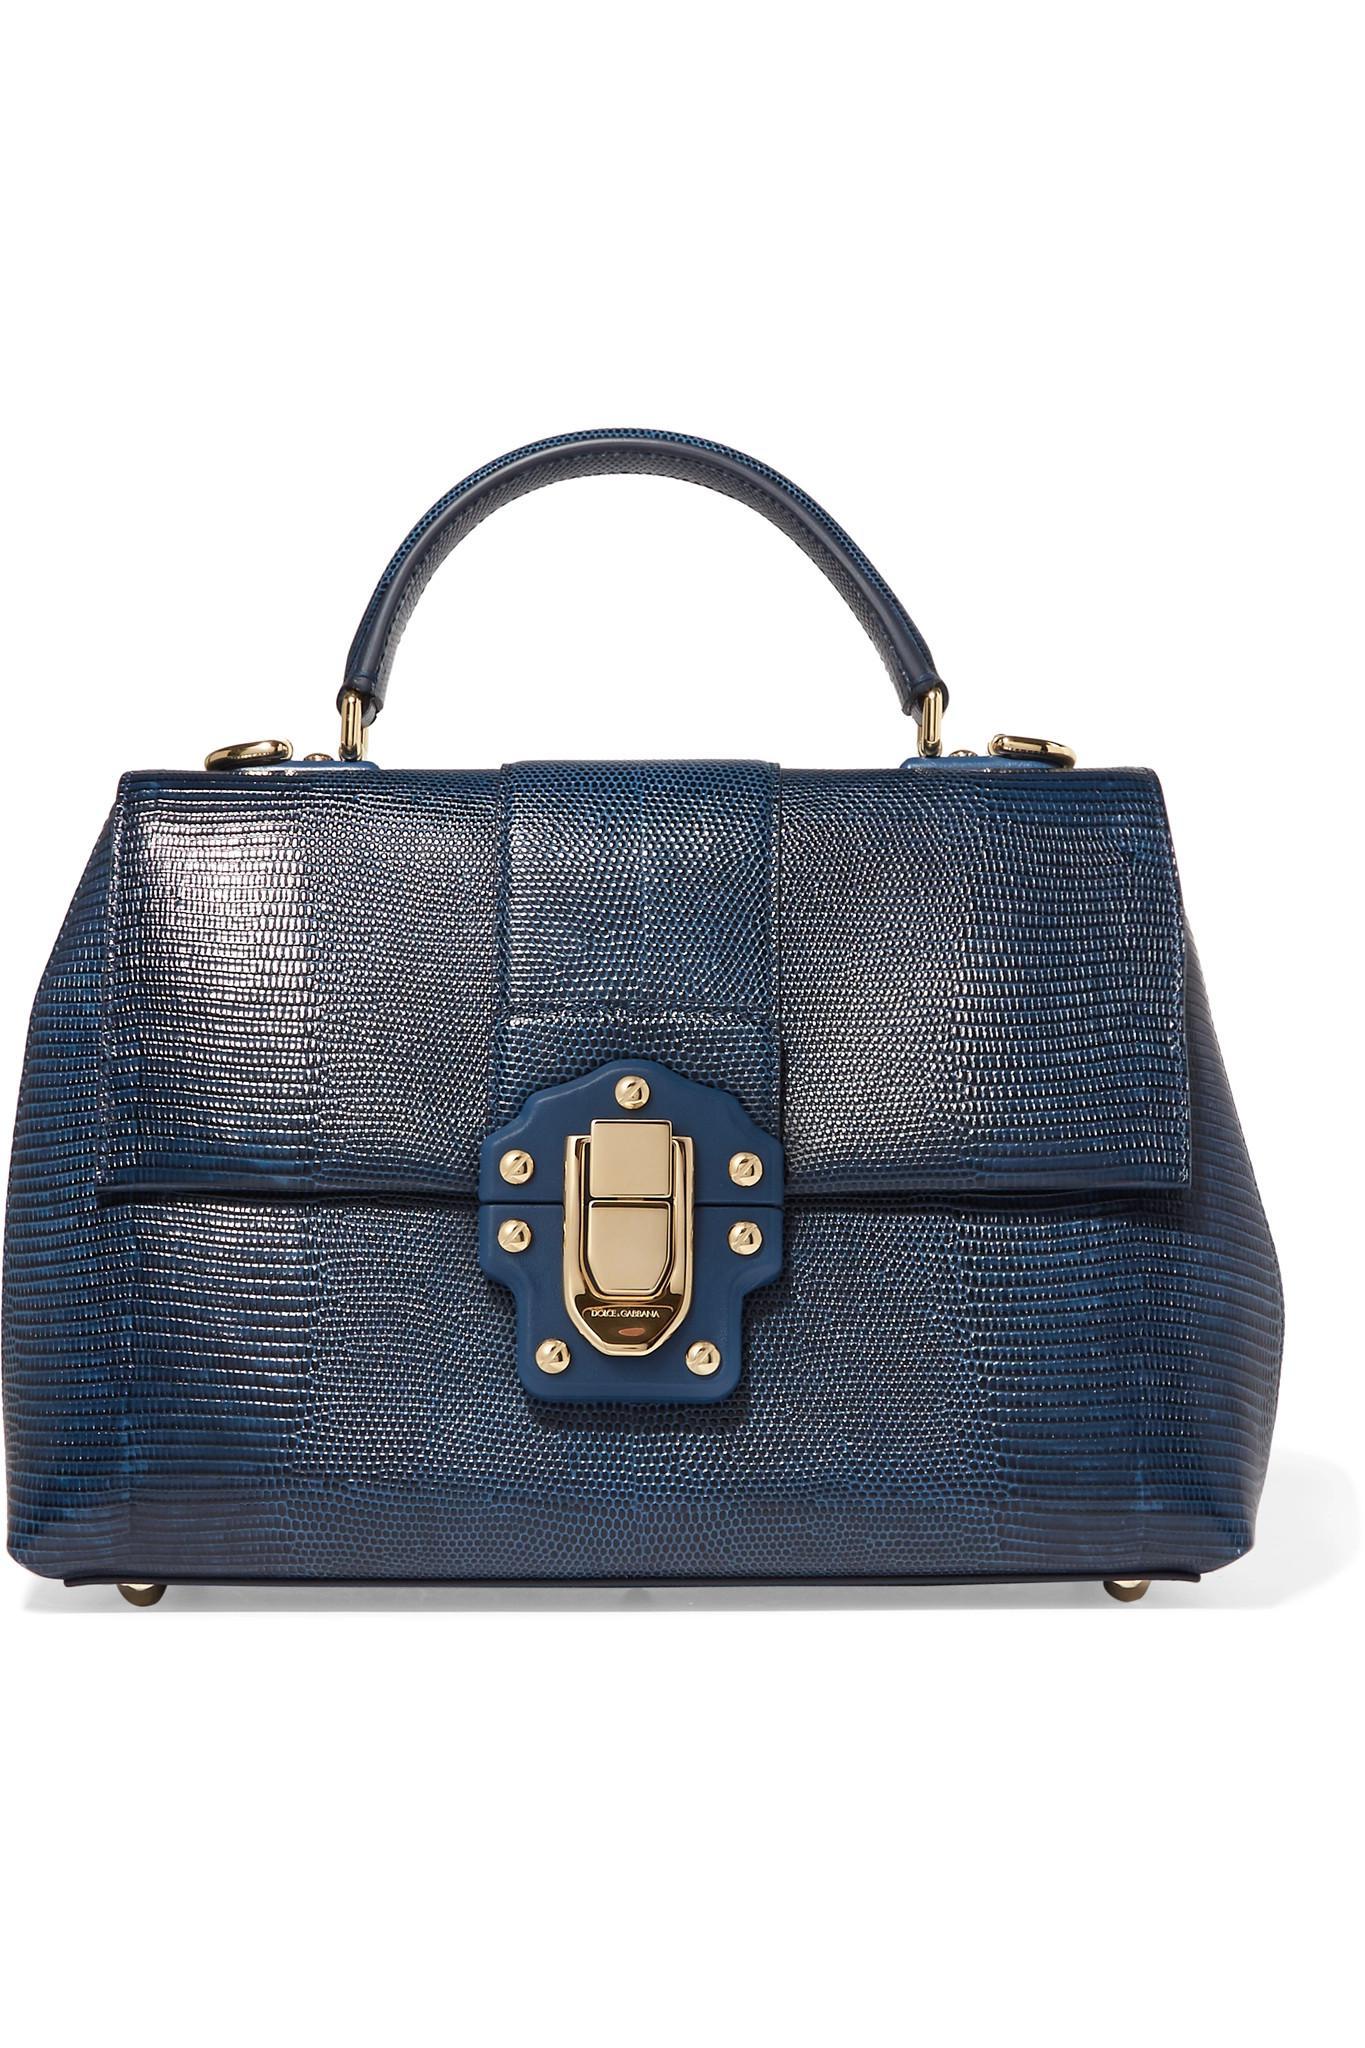 7705f8bab038 Lyst - Dolce   Gabbana Lucia Lizard-effect Leather Tote in Blue